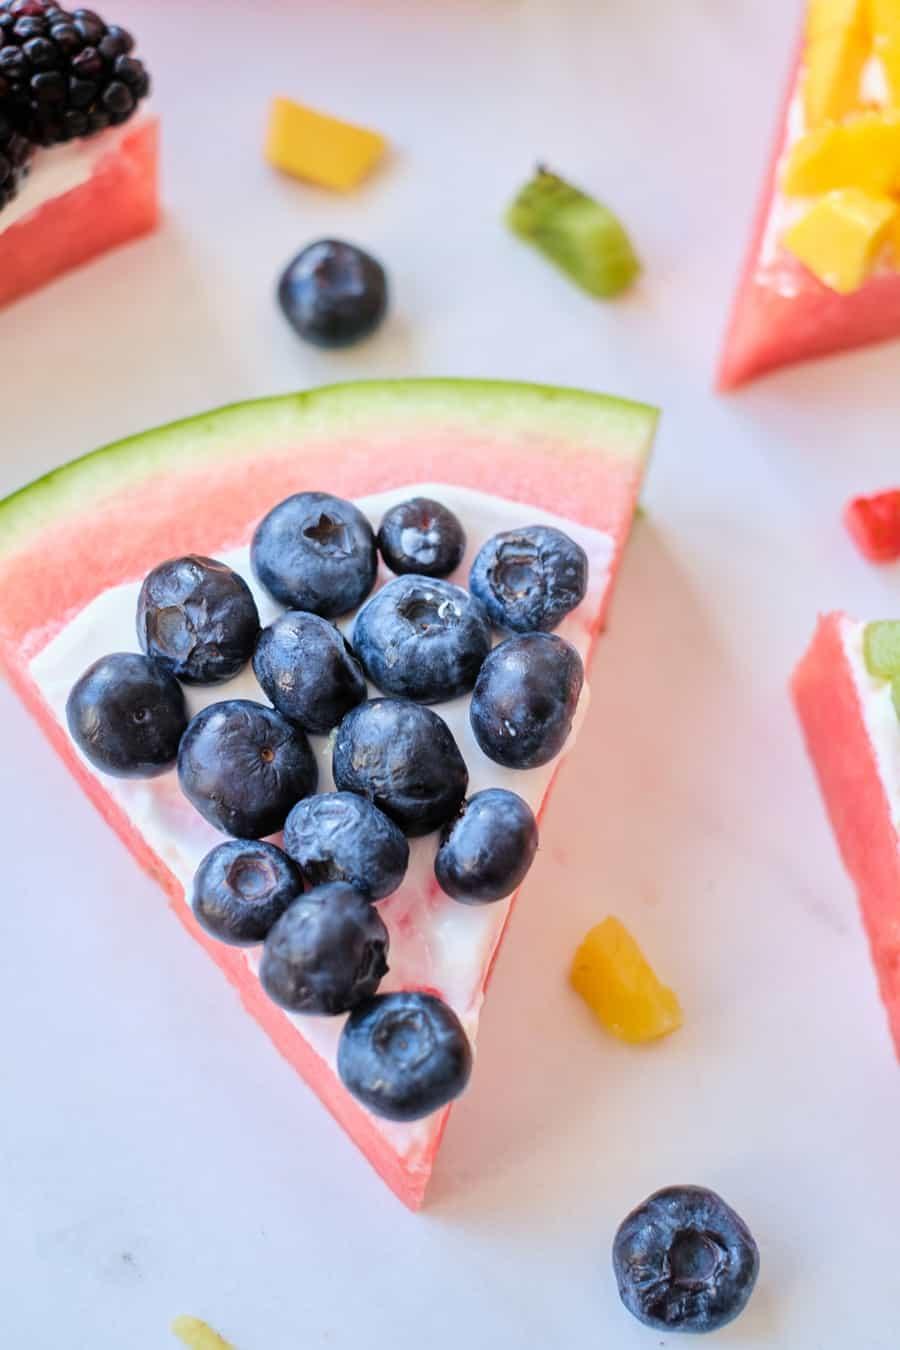 rainbow fruit snack for kids - watermelon pizza